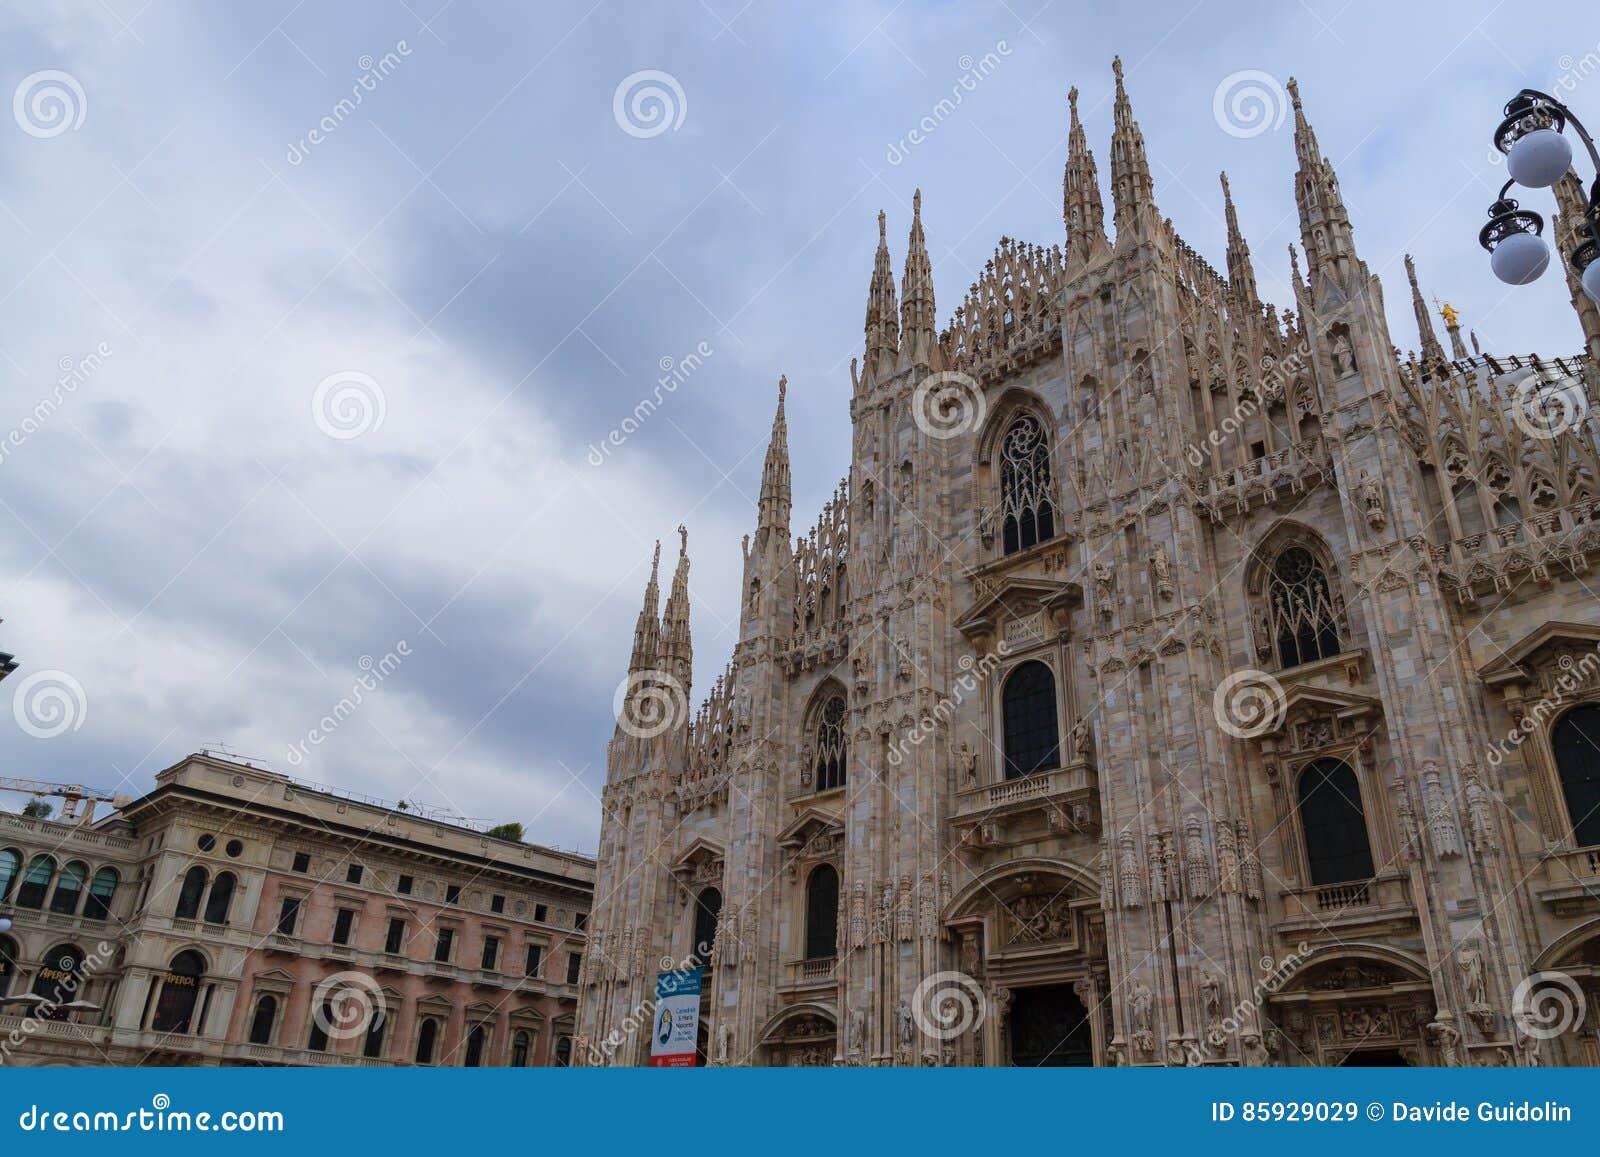 Famous Italian Architecture milan cathedral, duomo di milano, view. famous italian landmark